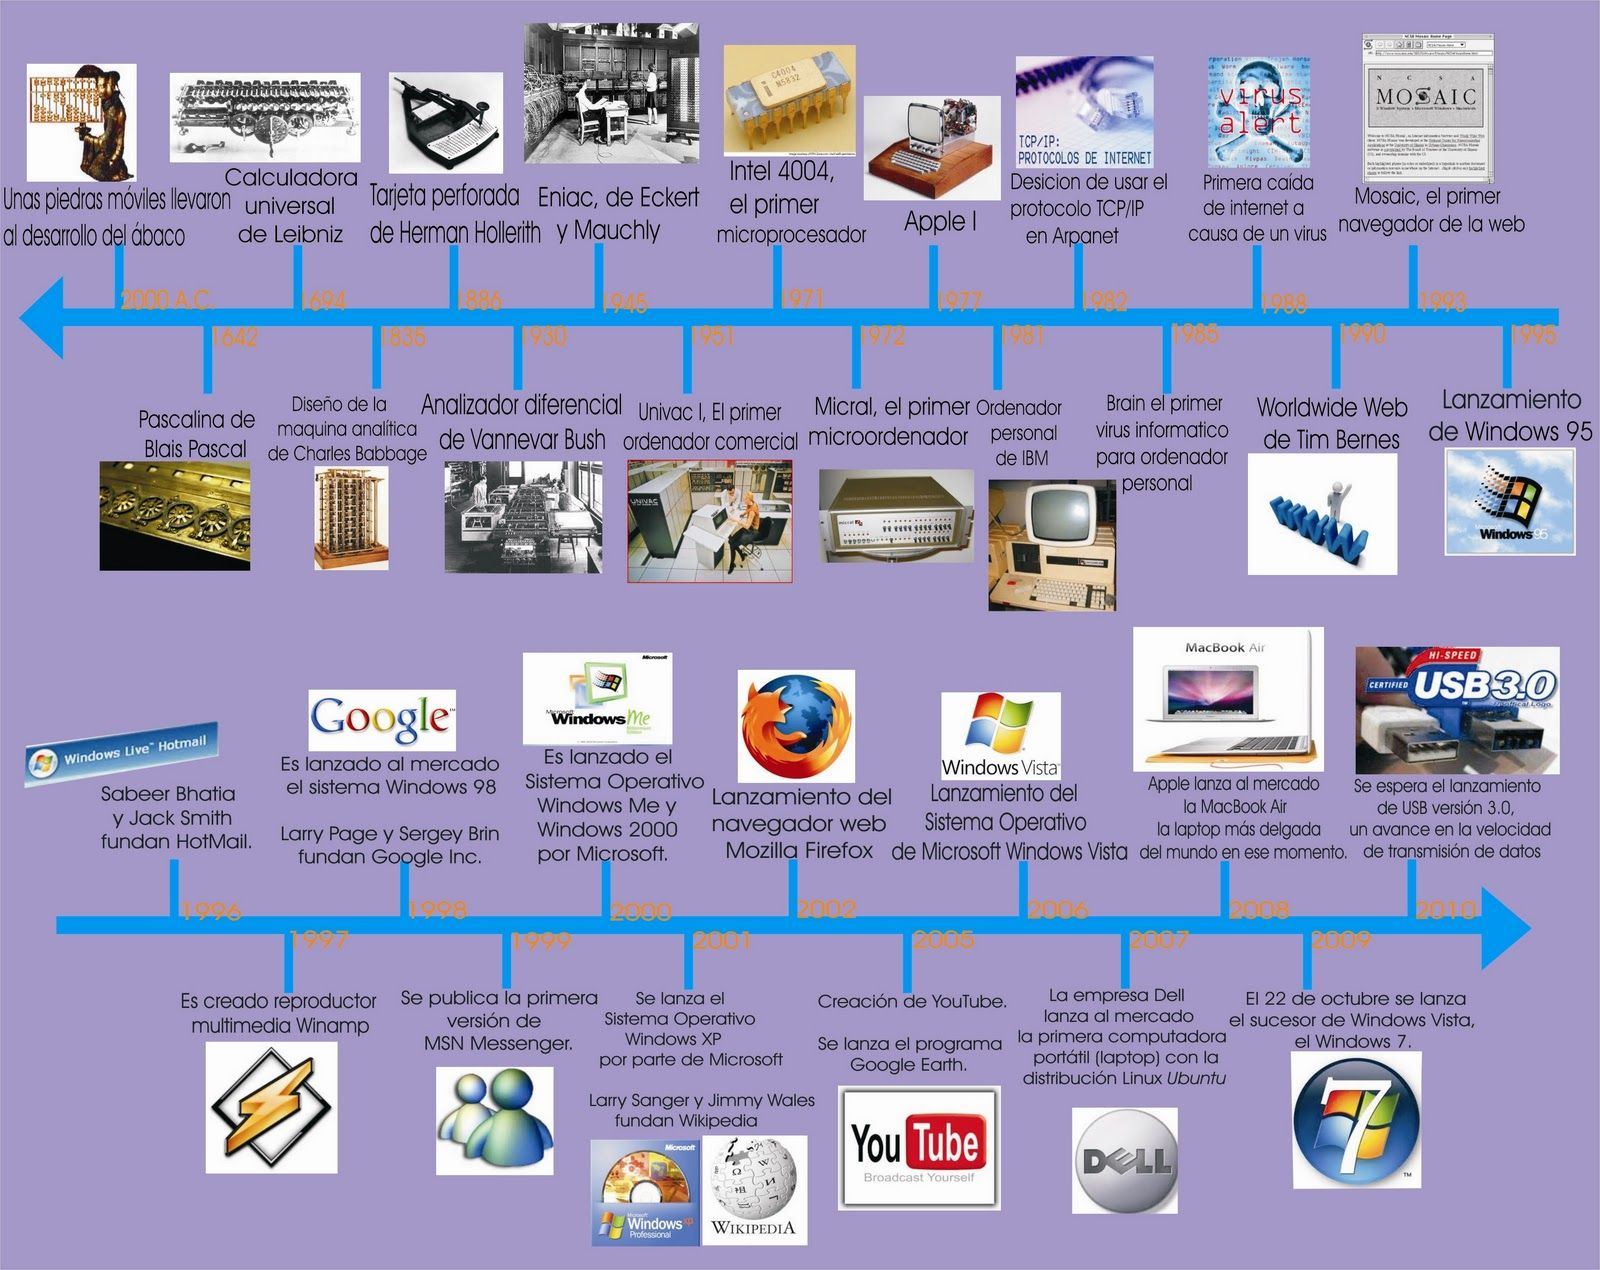 Linea Del Tiempo Informatico Linea Del Tiempo Historia Lineas De Tiempo Historia Linea Del Tiempo